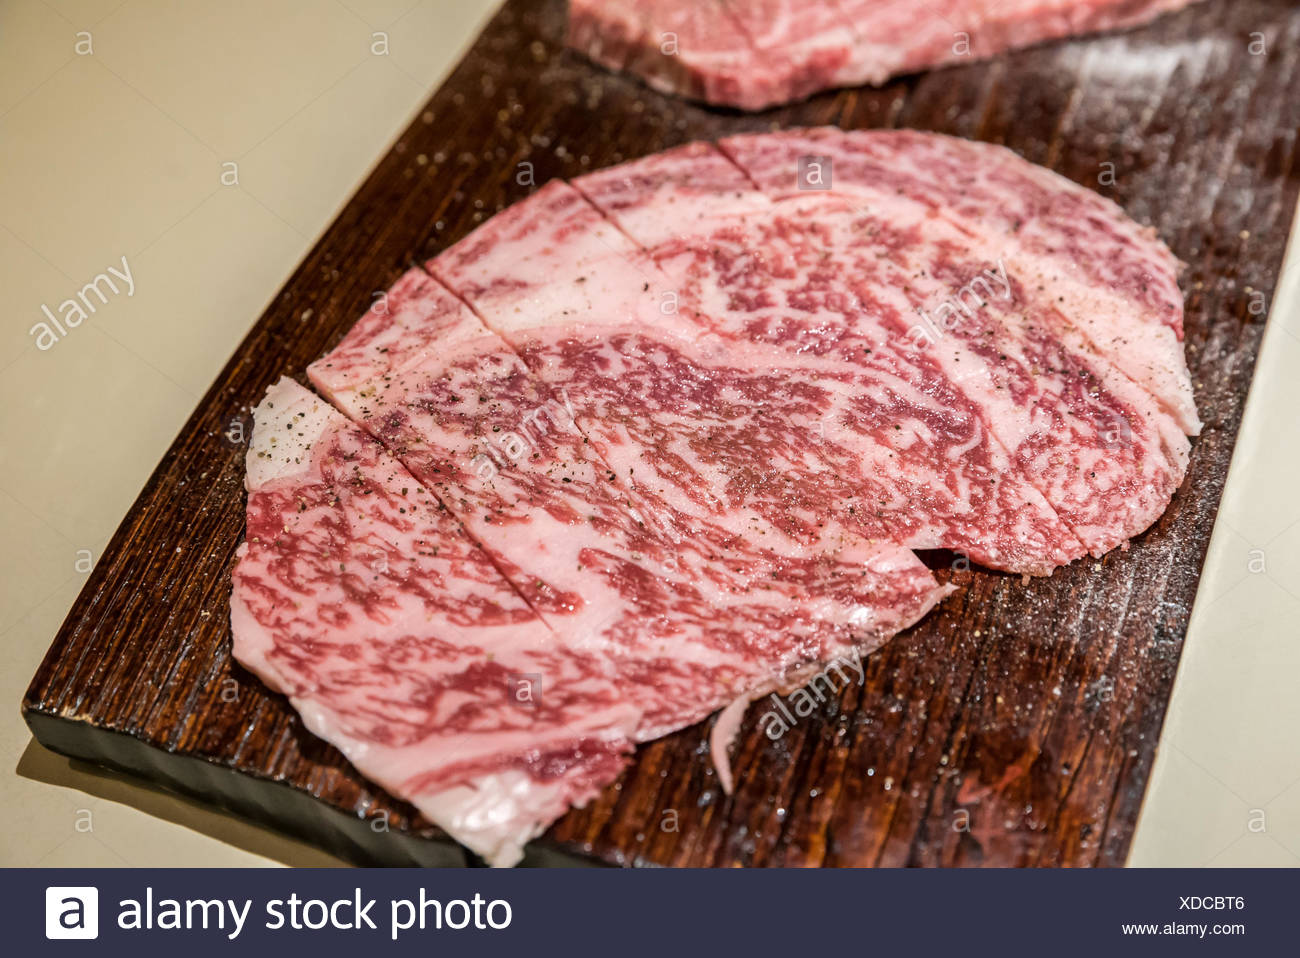 wagyu A5 Beef - Stock Image